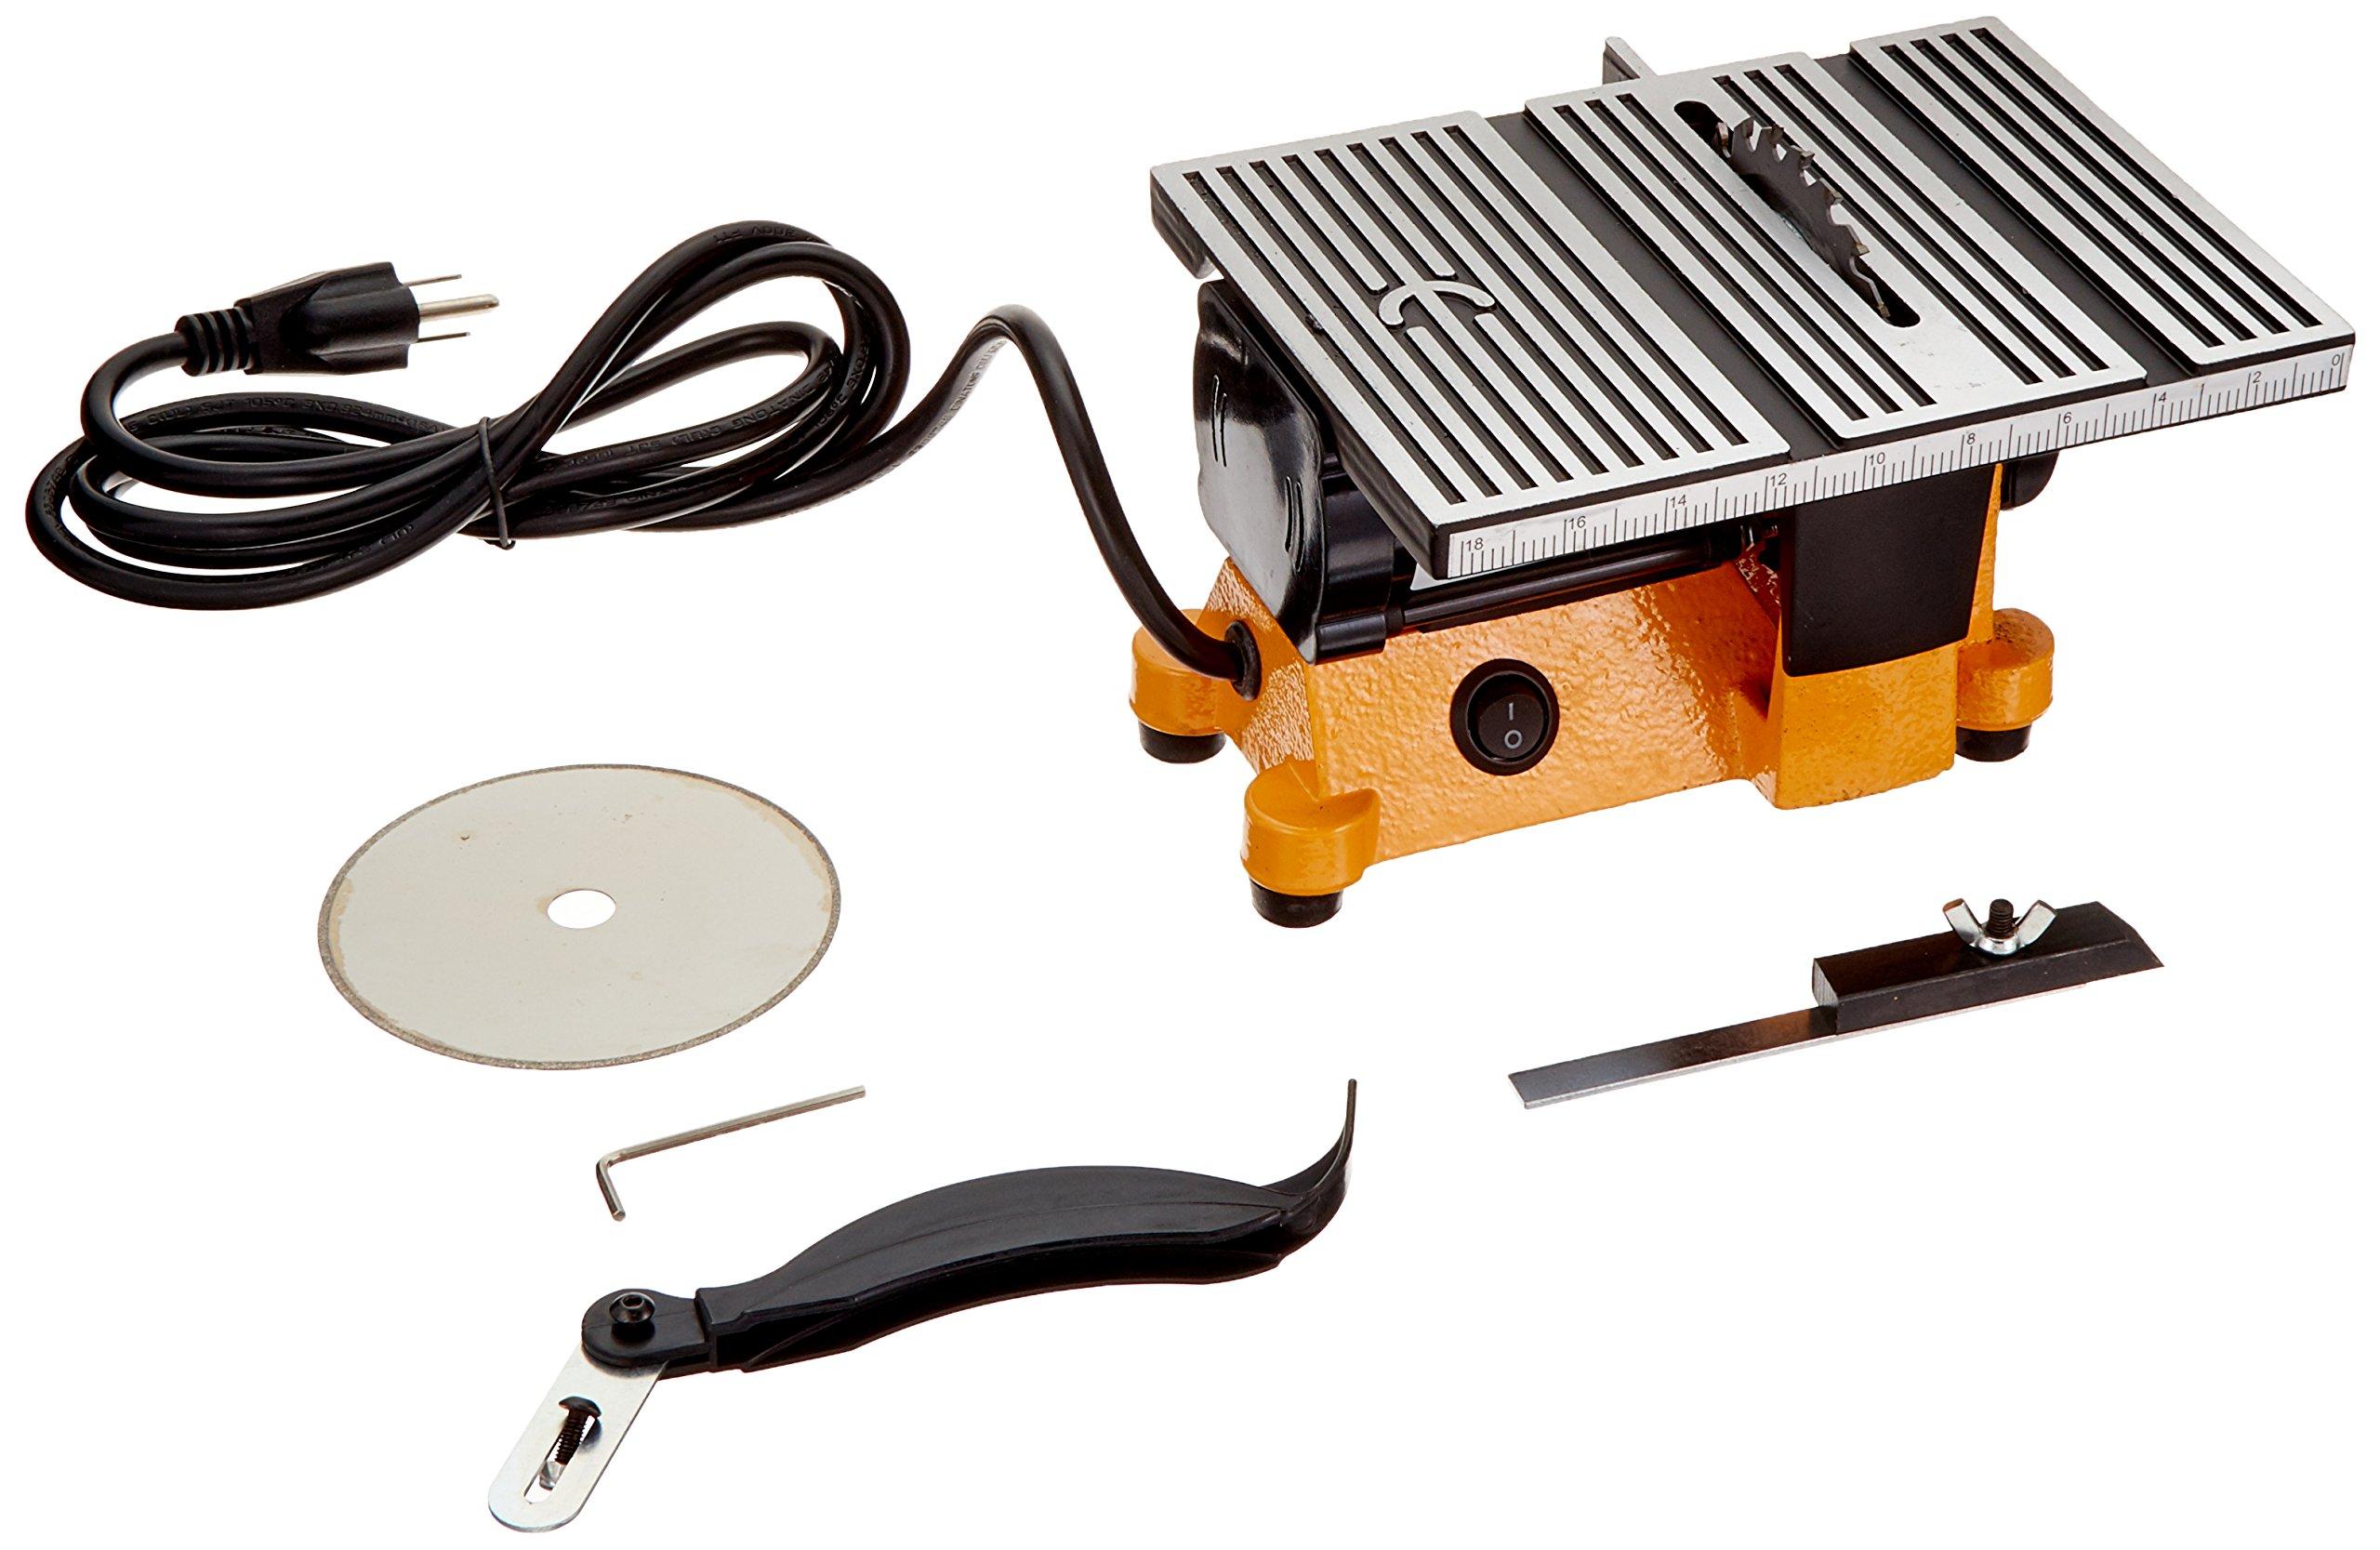 TruePower 01-0819 Mini Electric Table Saw, 4-Inch by Gino Development